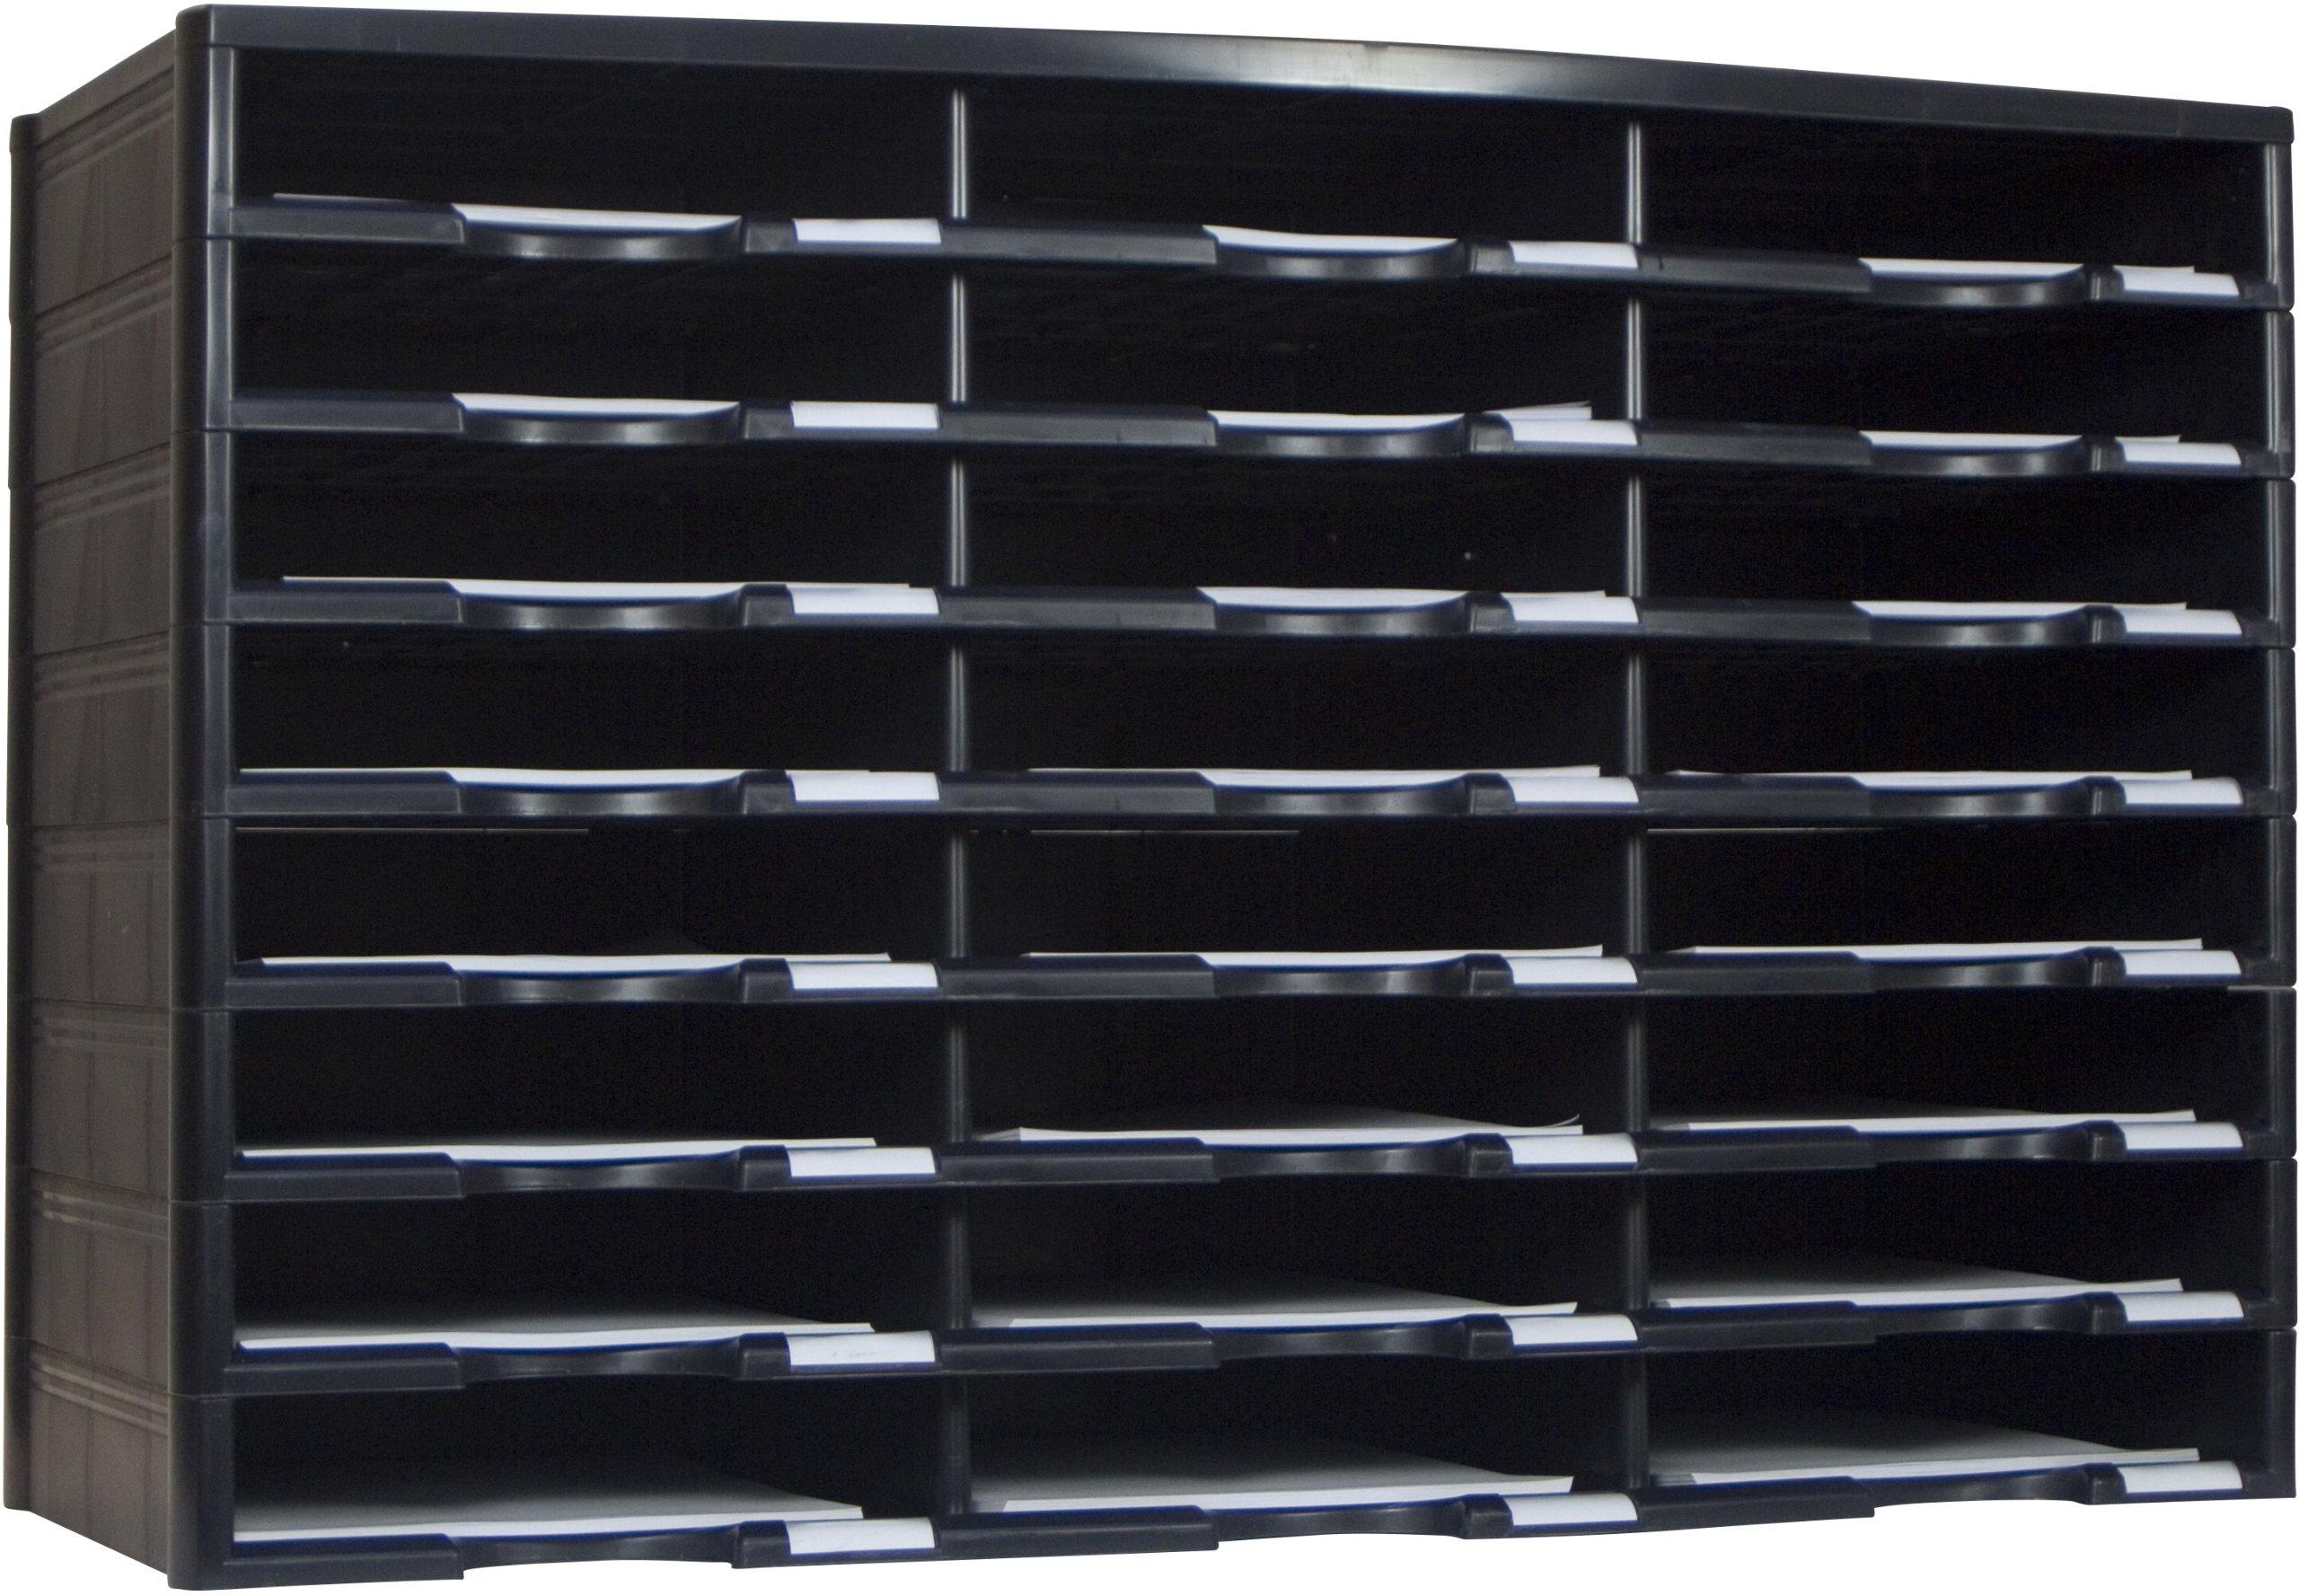 Storex 24-Compartment Literature Organizer, 31.38 x 14.13 x 20.5'', Black (61435U01C)